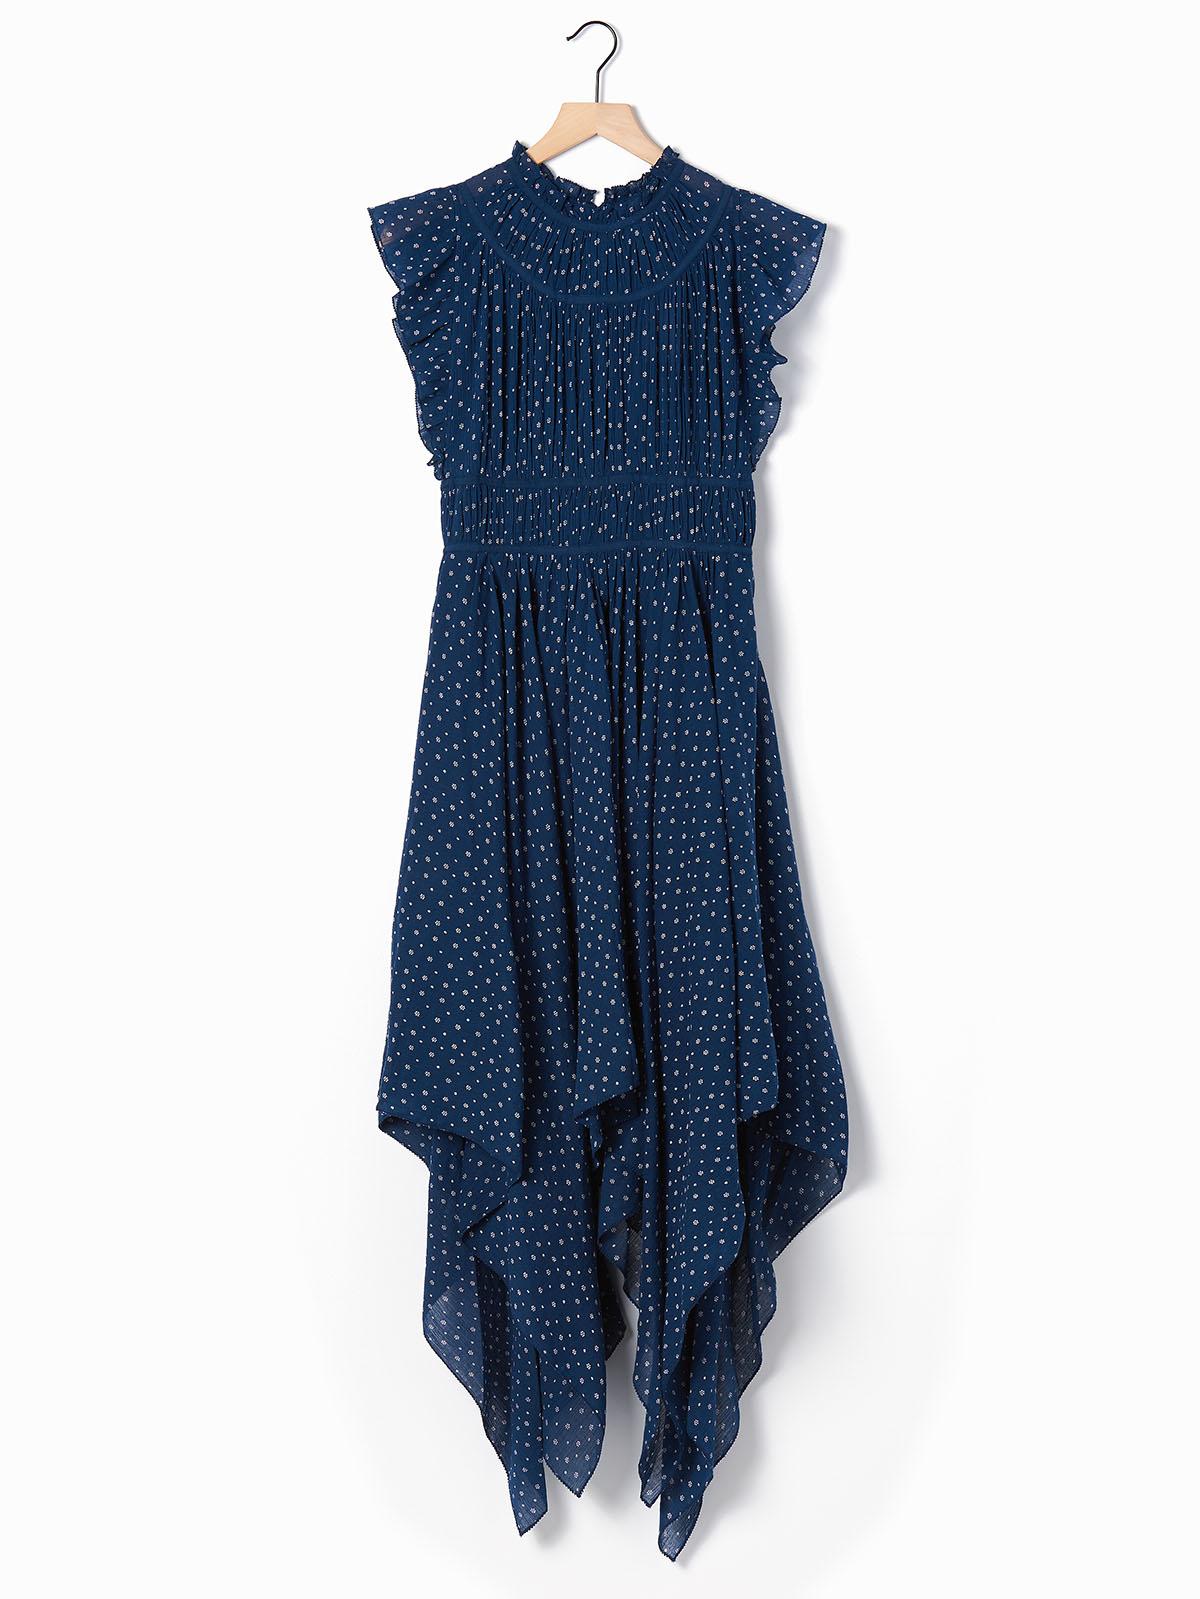 French_Italian_Brock_Collection_Danna_Dress_01.jpg